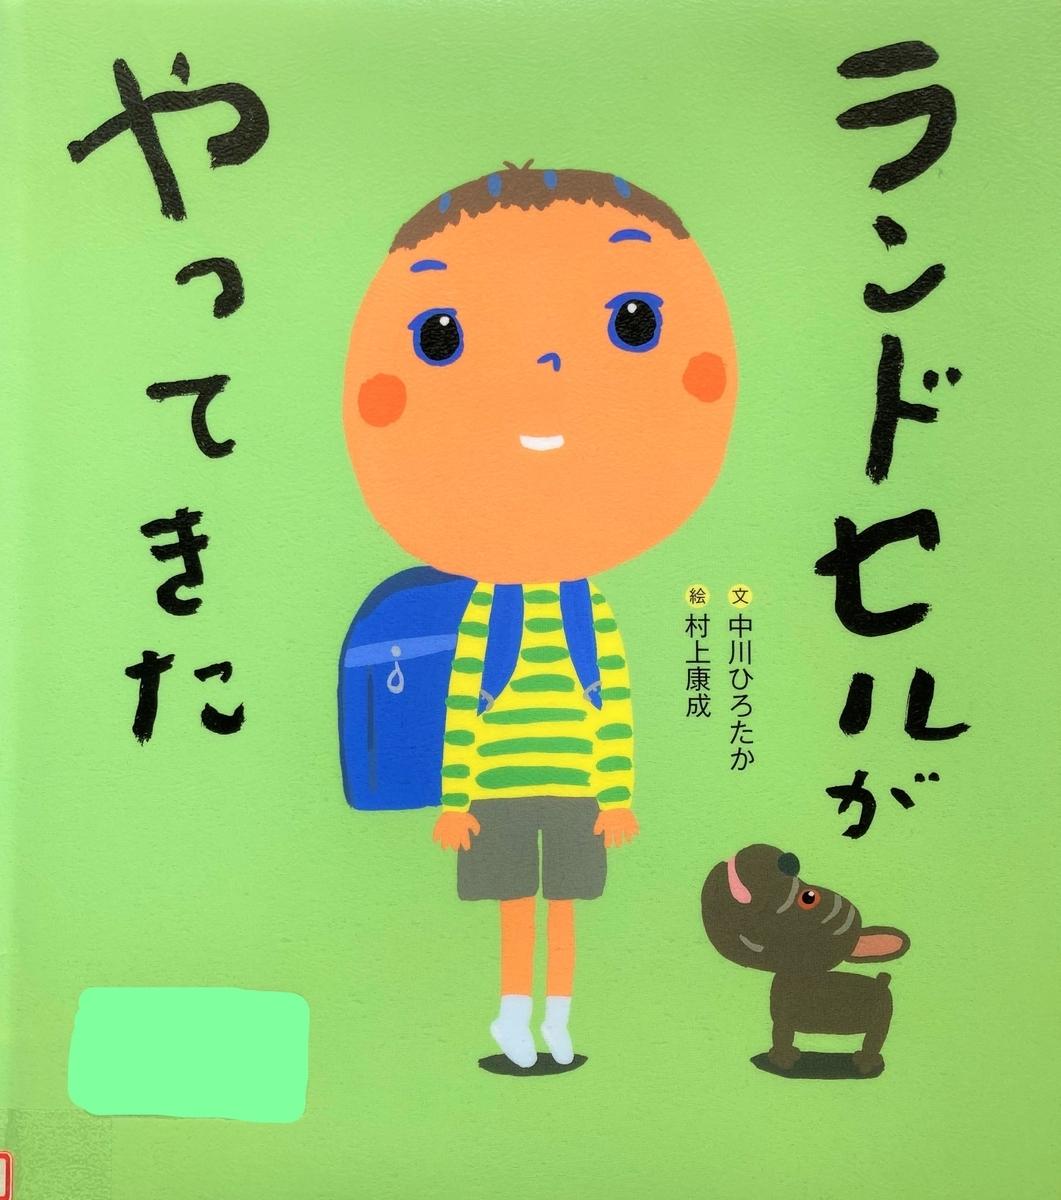 f:id:ehondesukusuku:20210525140302j:plain